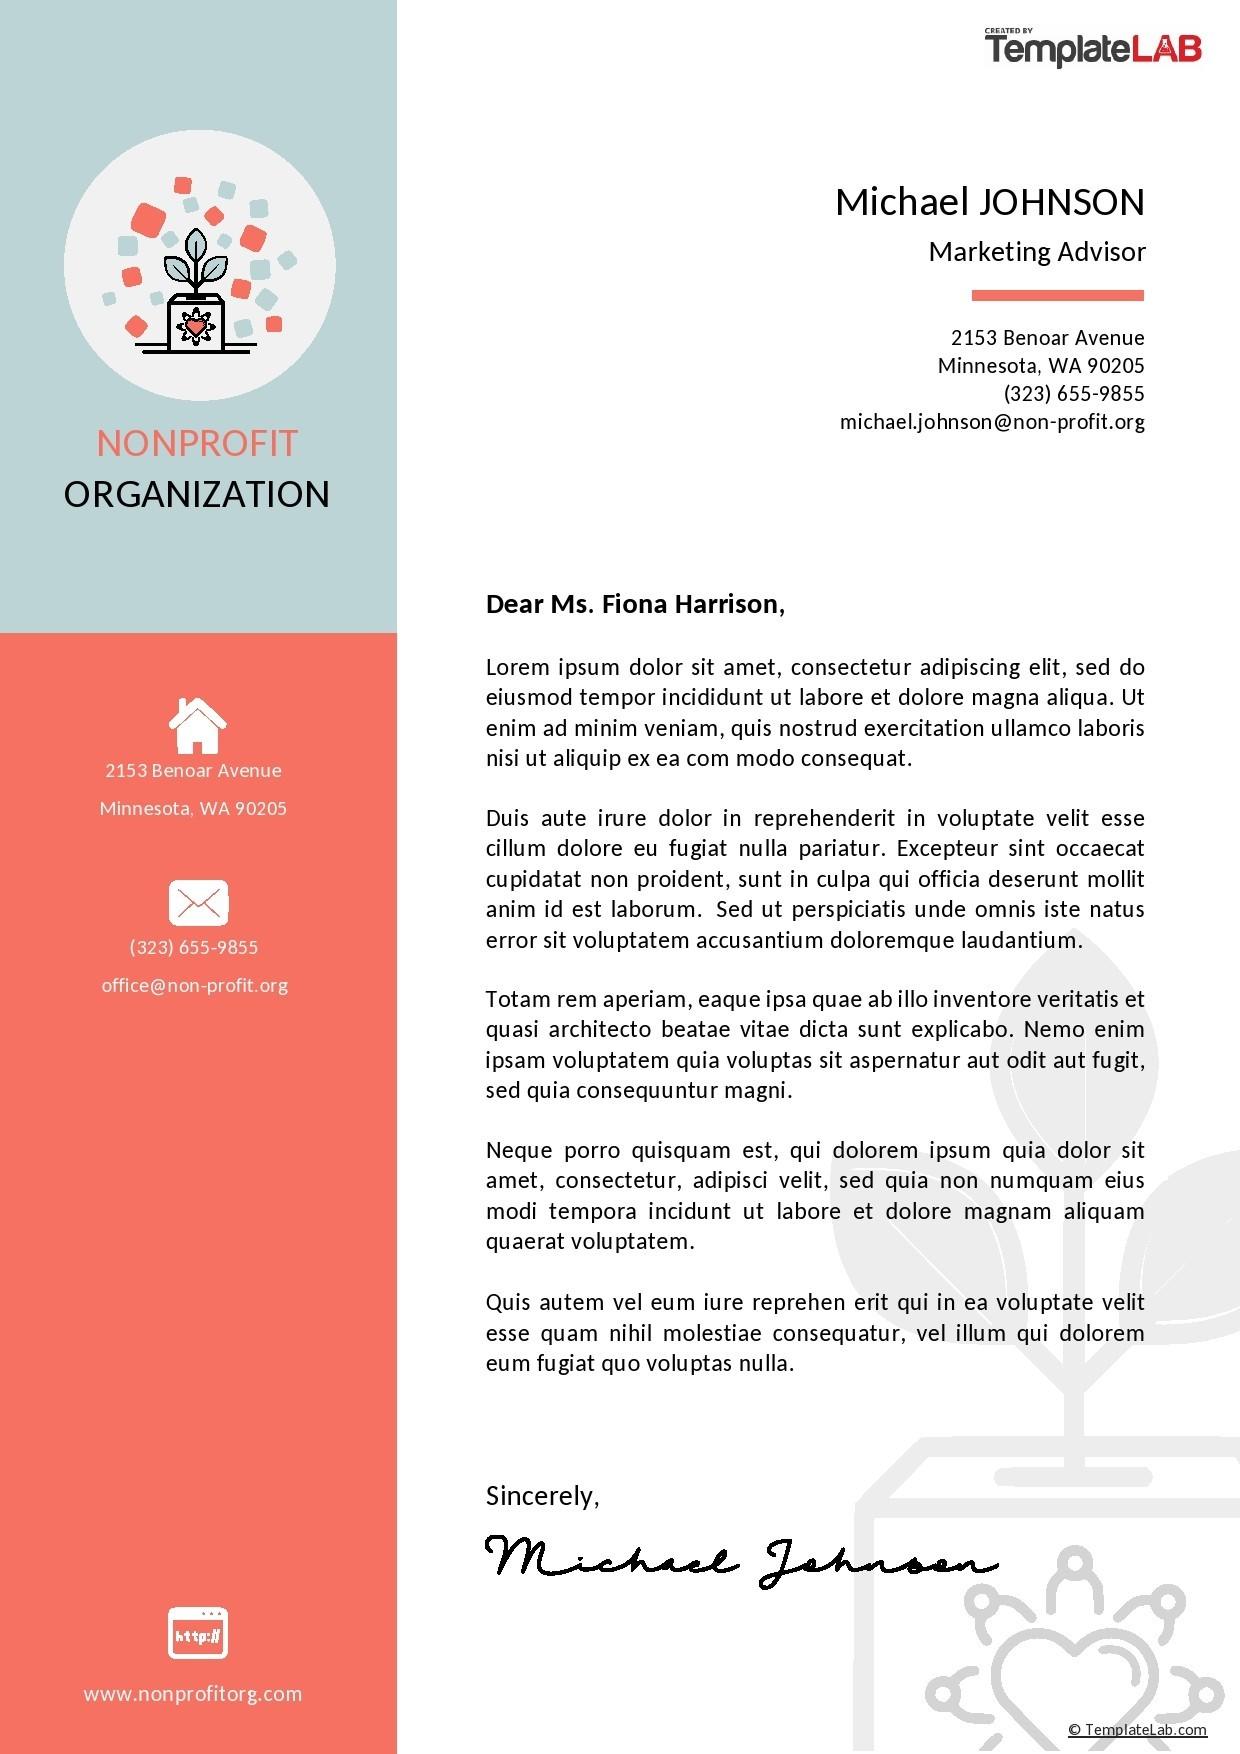 Free Nonprofit Letterhead Template - TemplateLab.com